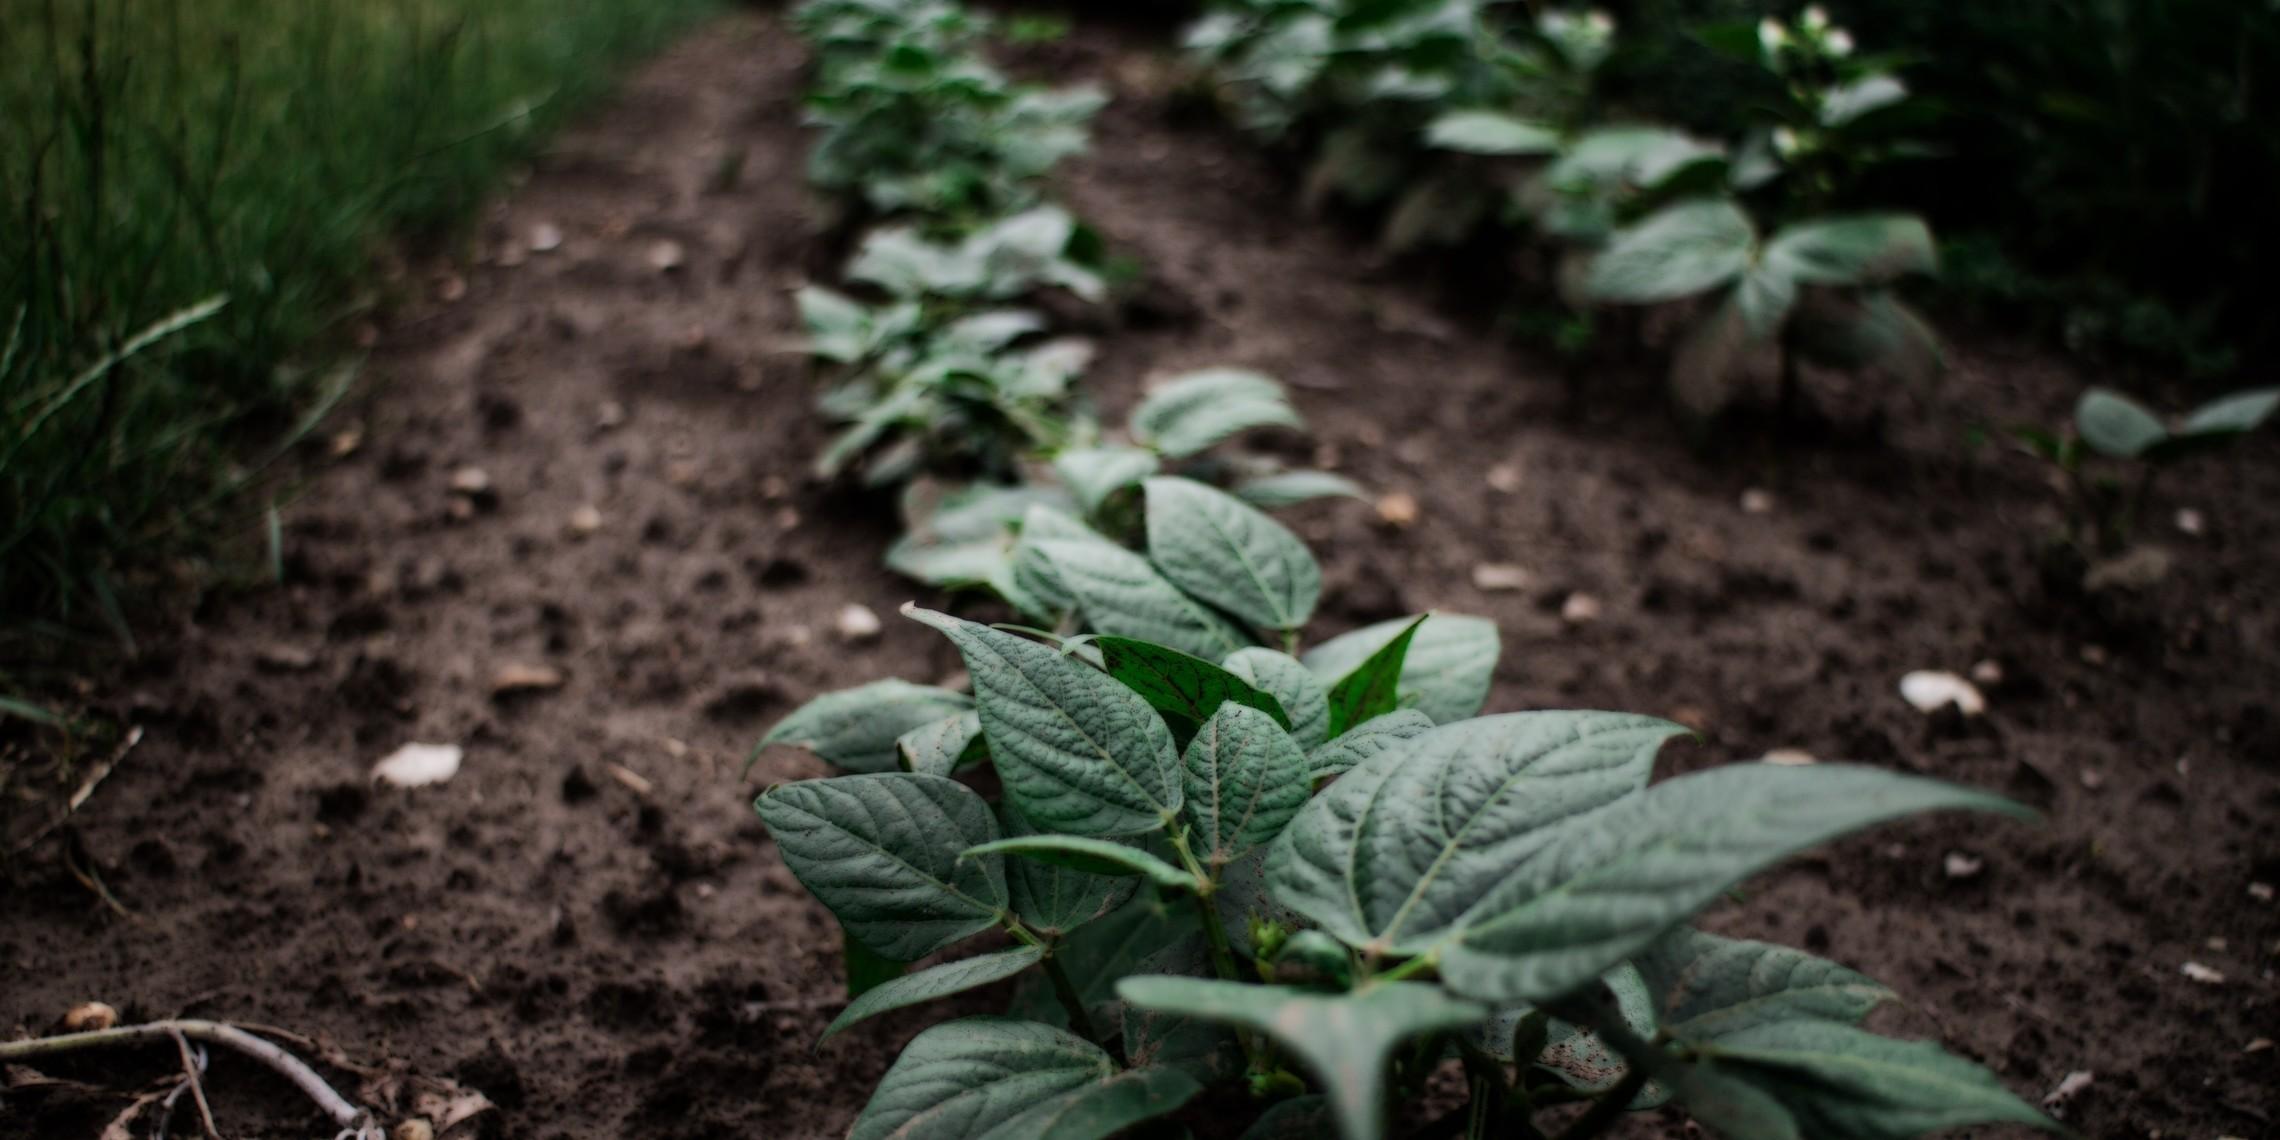 Soil image